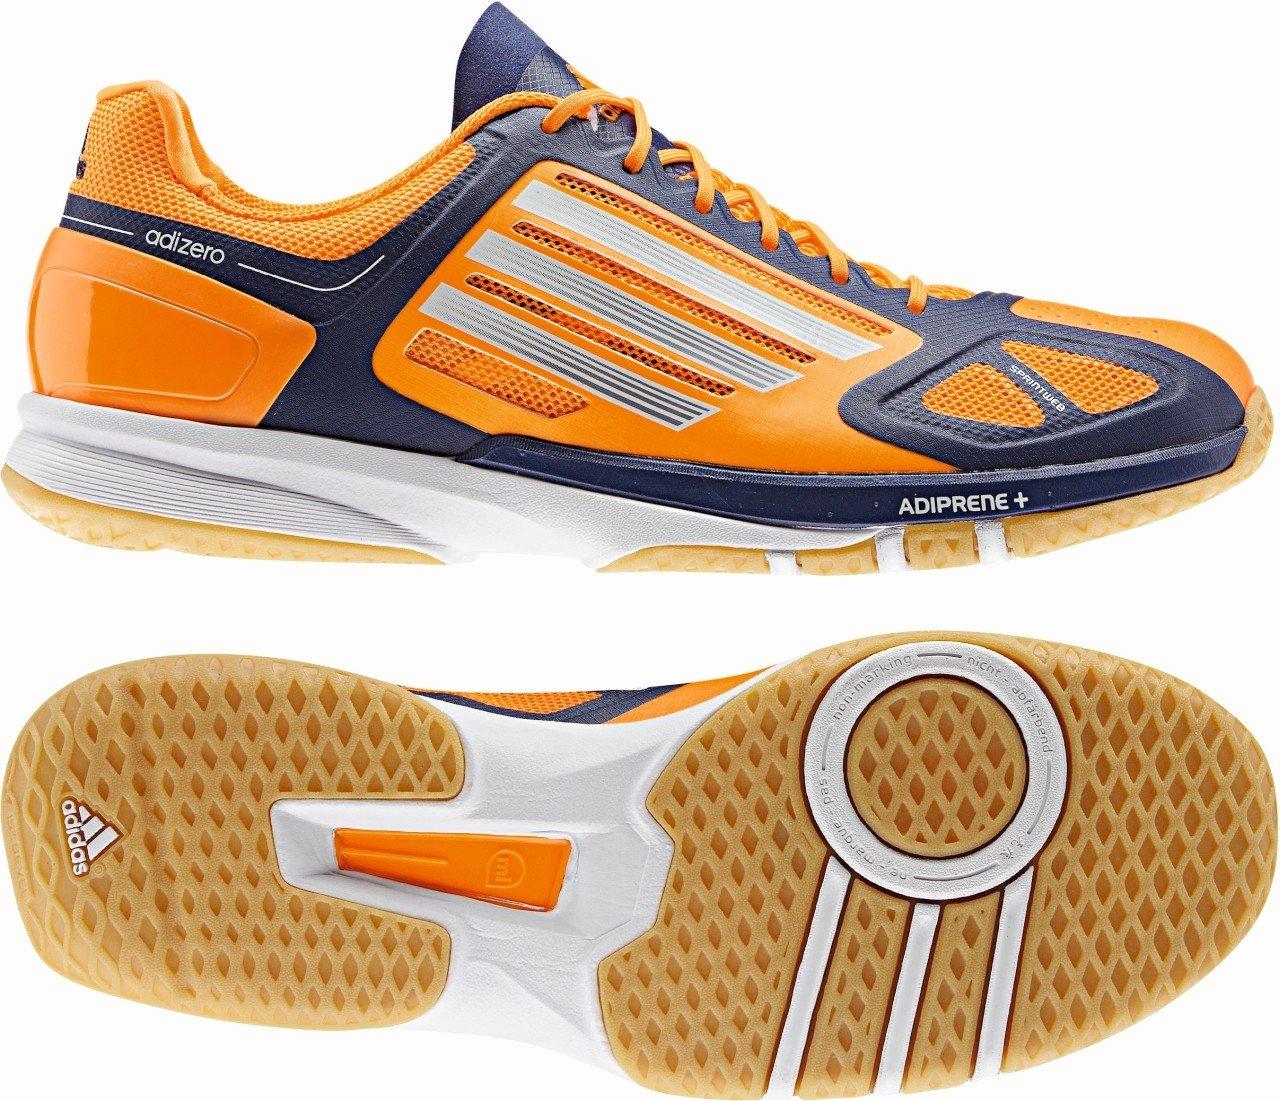 Adidas Schuhe Handball adizero Feather Feather Feather Pro solzes runwh 9b6dda